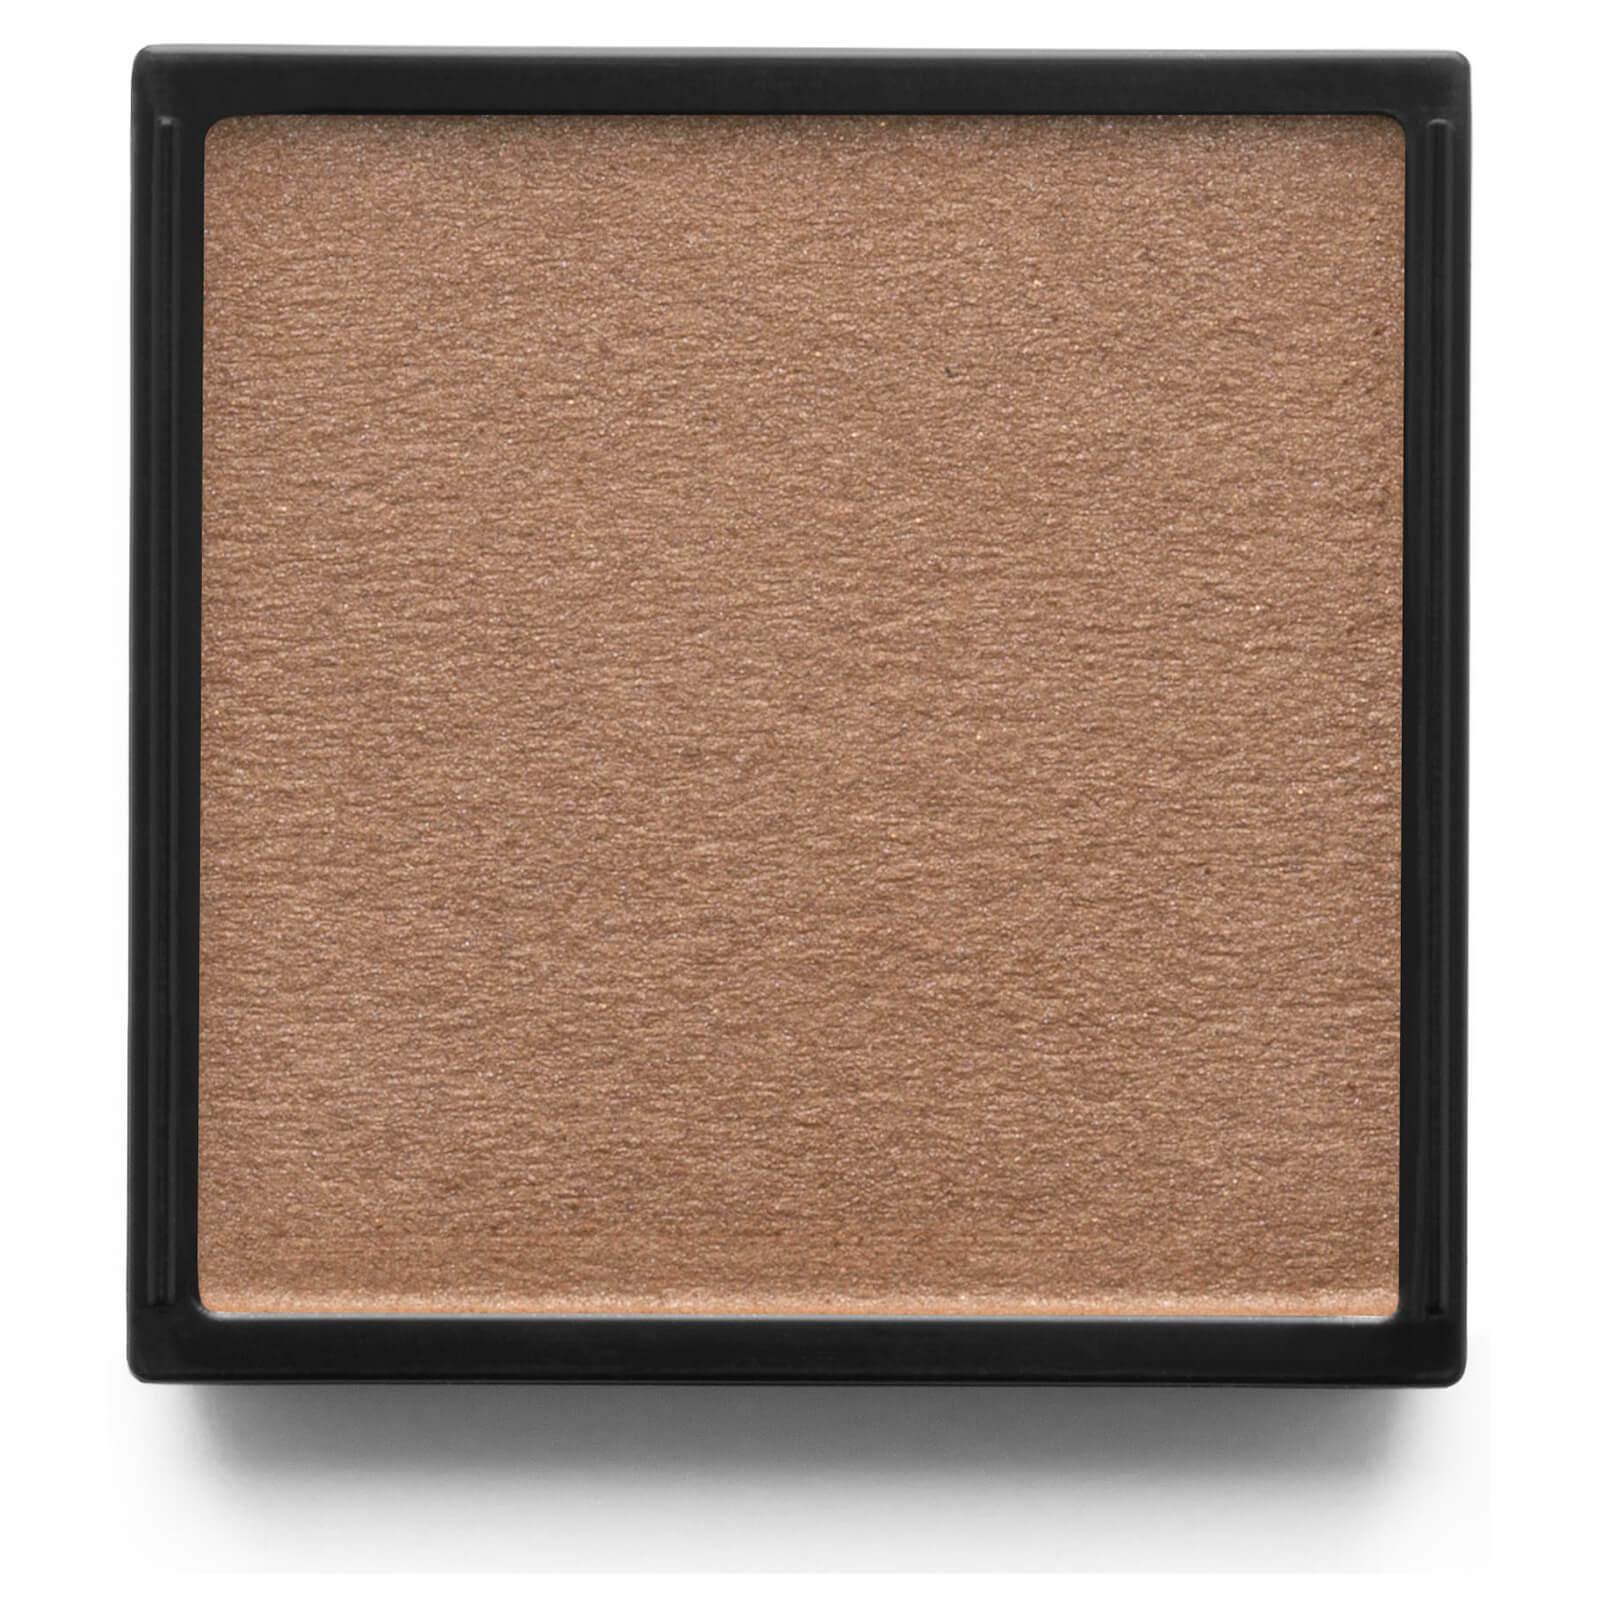 Купить Surratt Artistique Eyeshadow 1.7g (Various Shades) - Brunatre